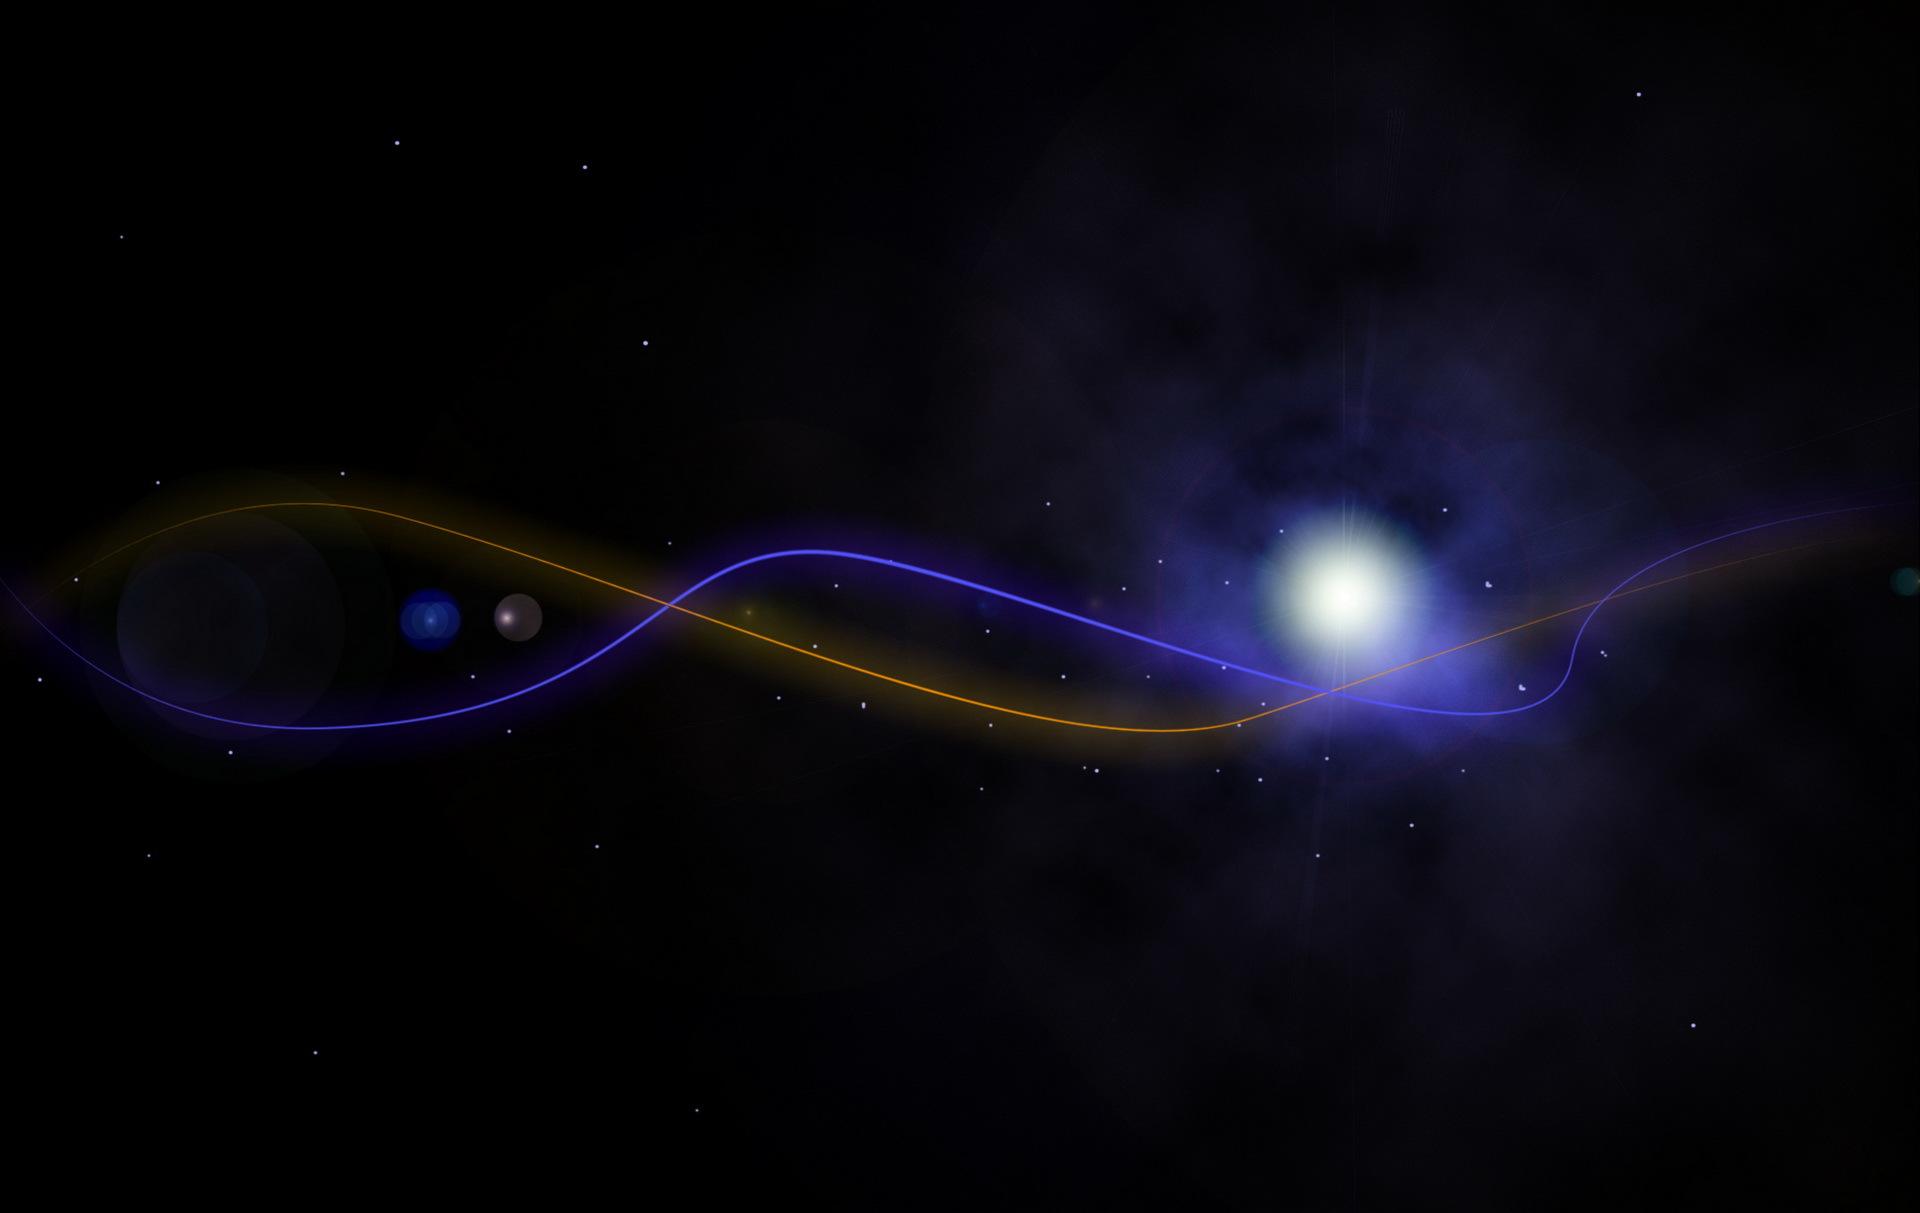 Картинка: Линии, свет, звёзды, туман, фон